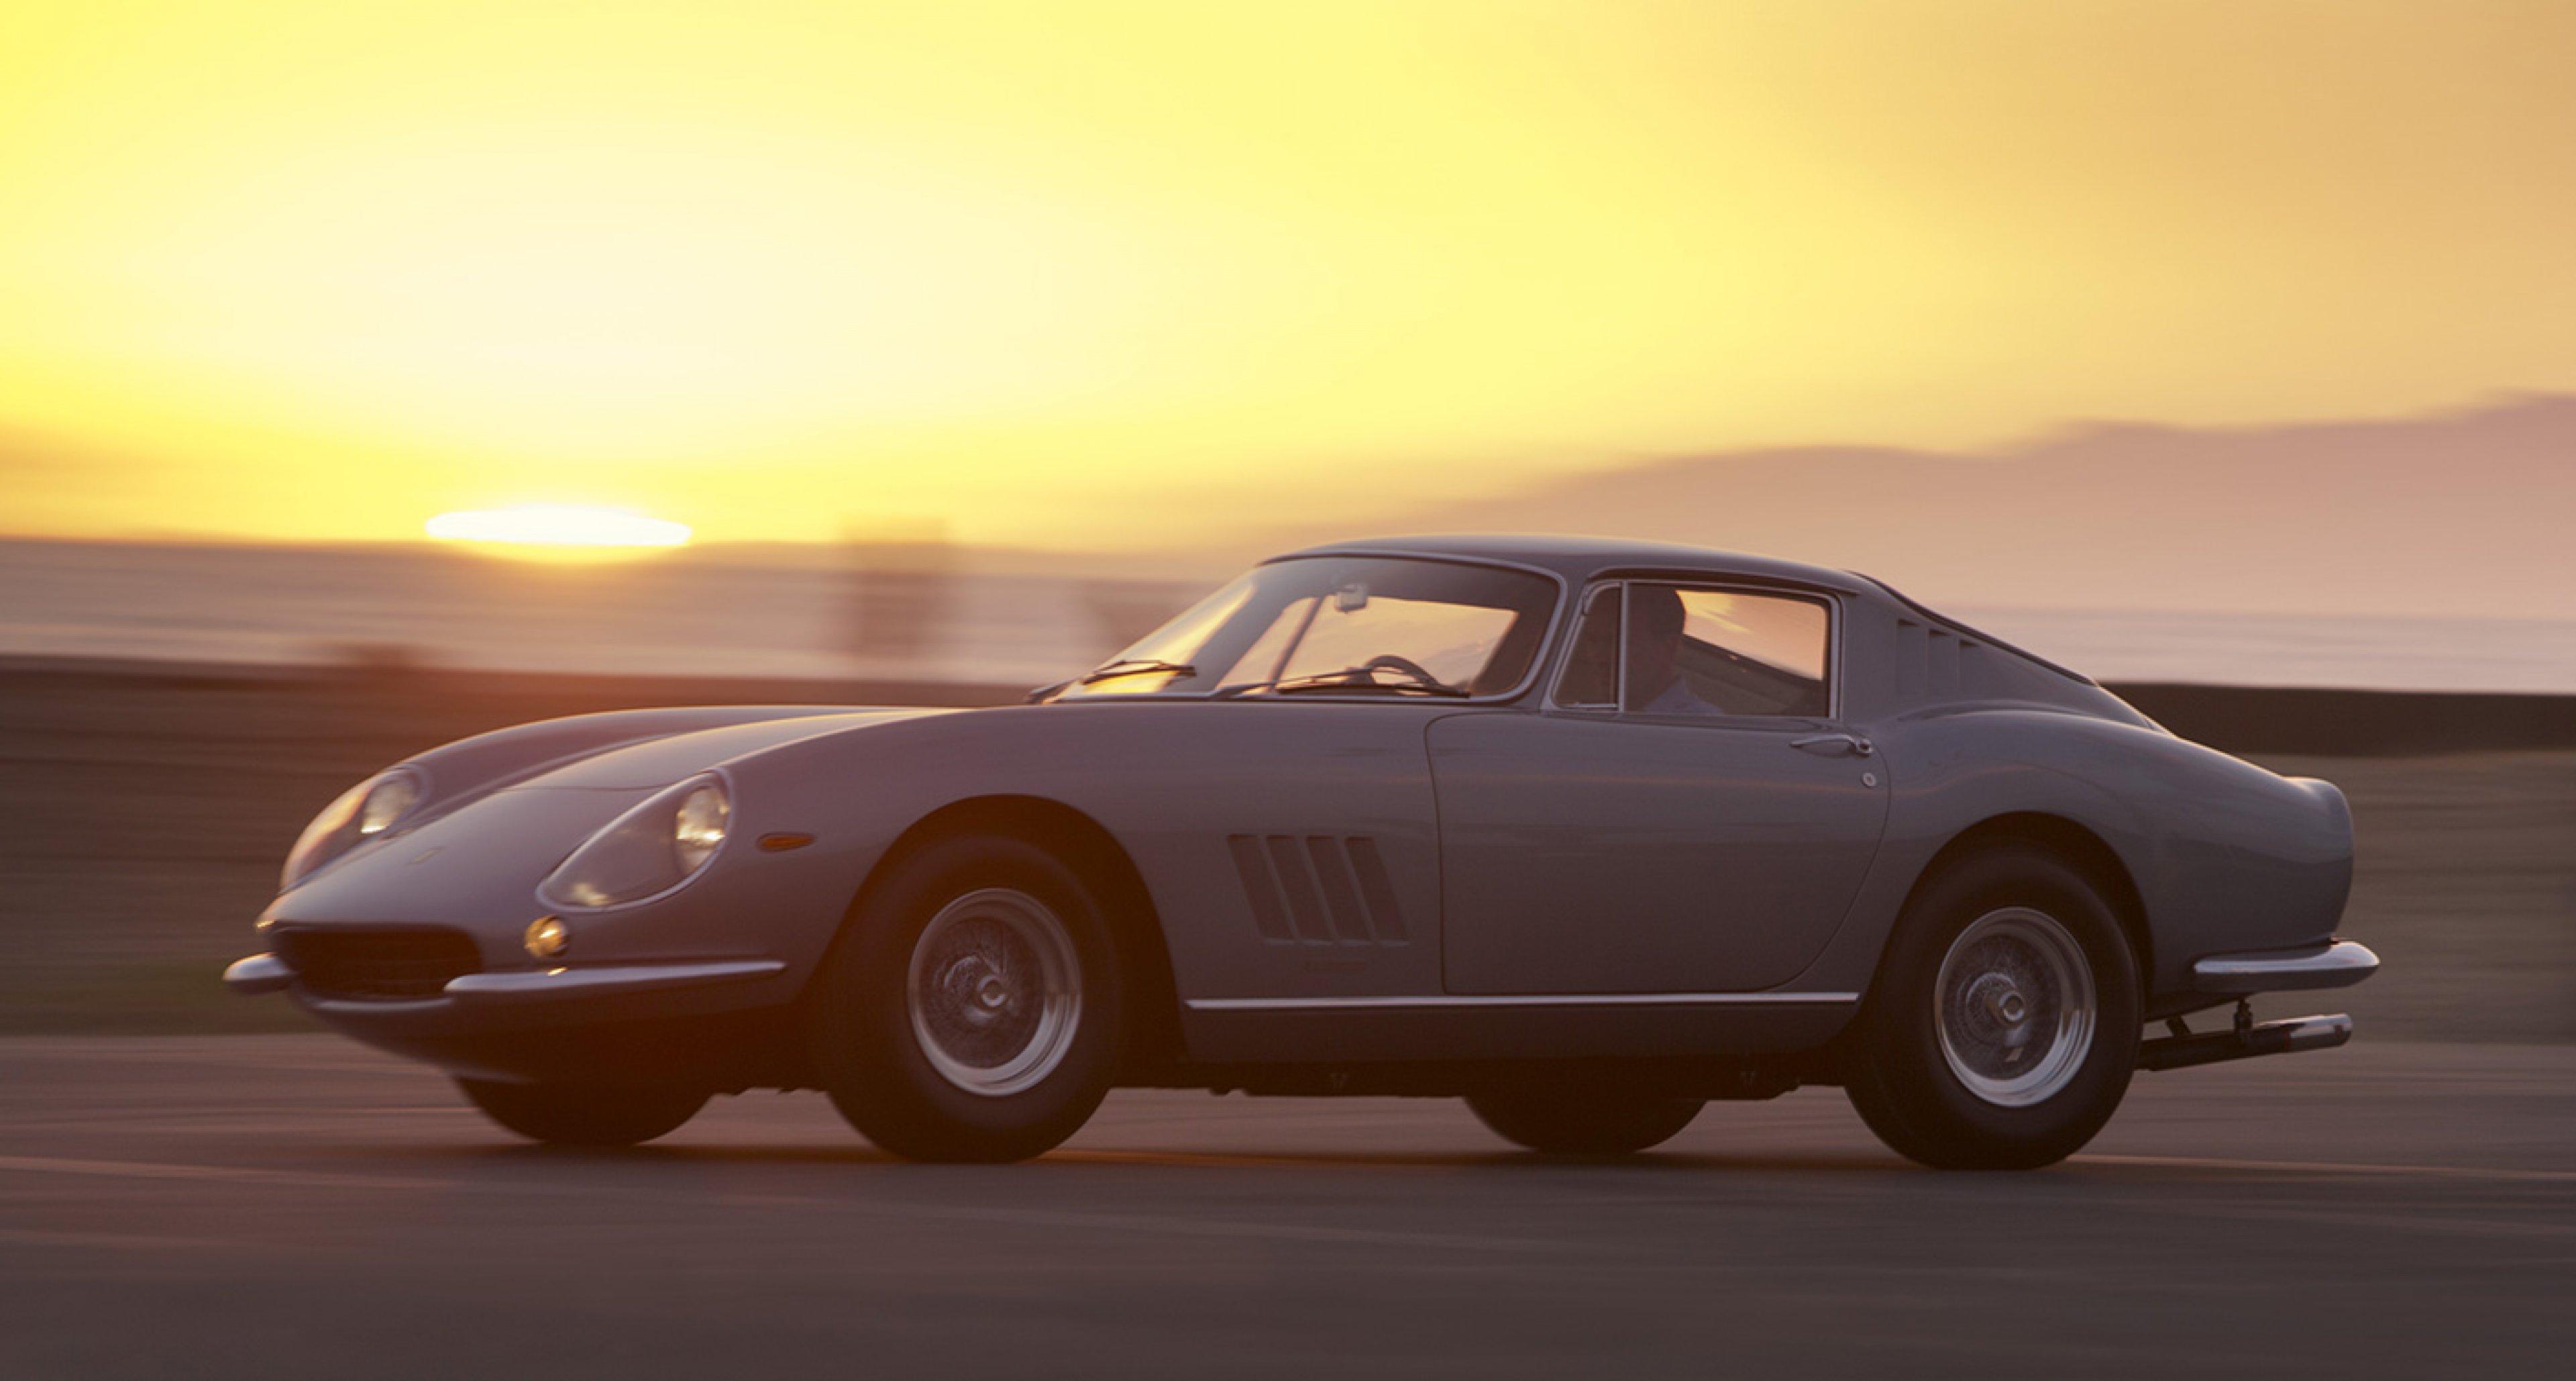 1966 Ferrari 275 GTB/6C sold by Bonhams for $2,640,000